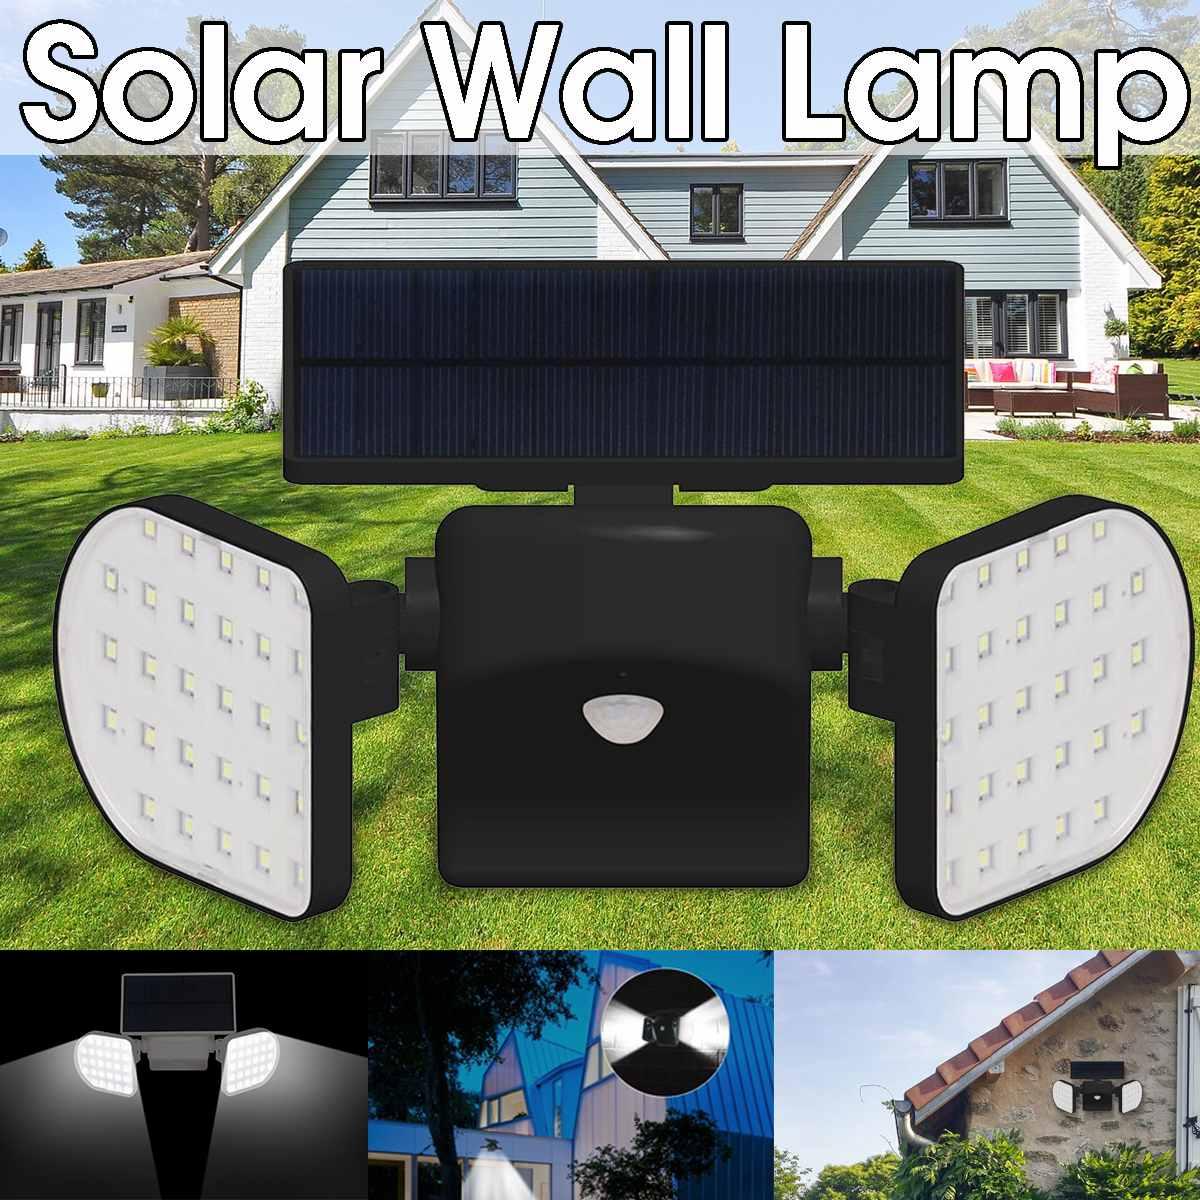 56LED 2 LED Panels 2200mAh IP65 Waterproof 360 Rotatable Solar Lamp Wall Lights PIR Motion Sensor Lamp Security Outdoor Garden